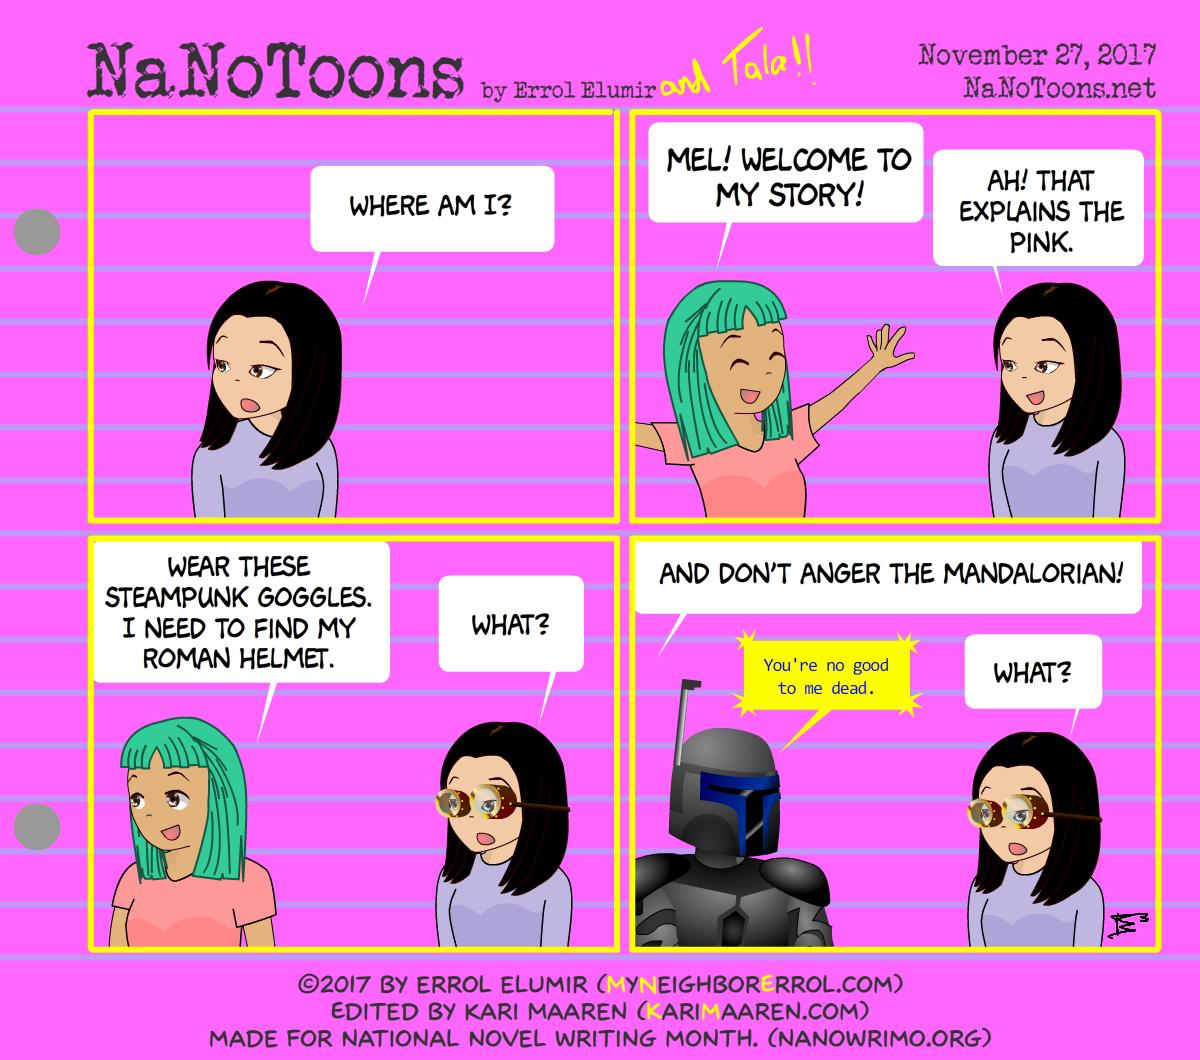 NaNoToons_2017_10_27